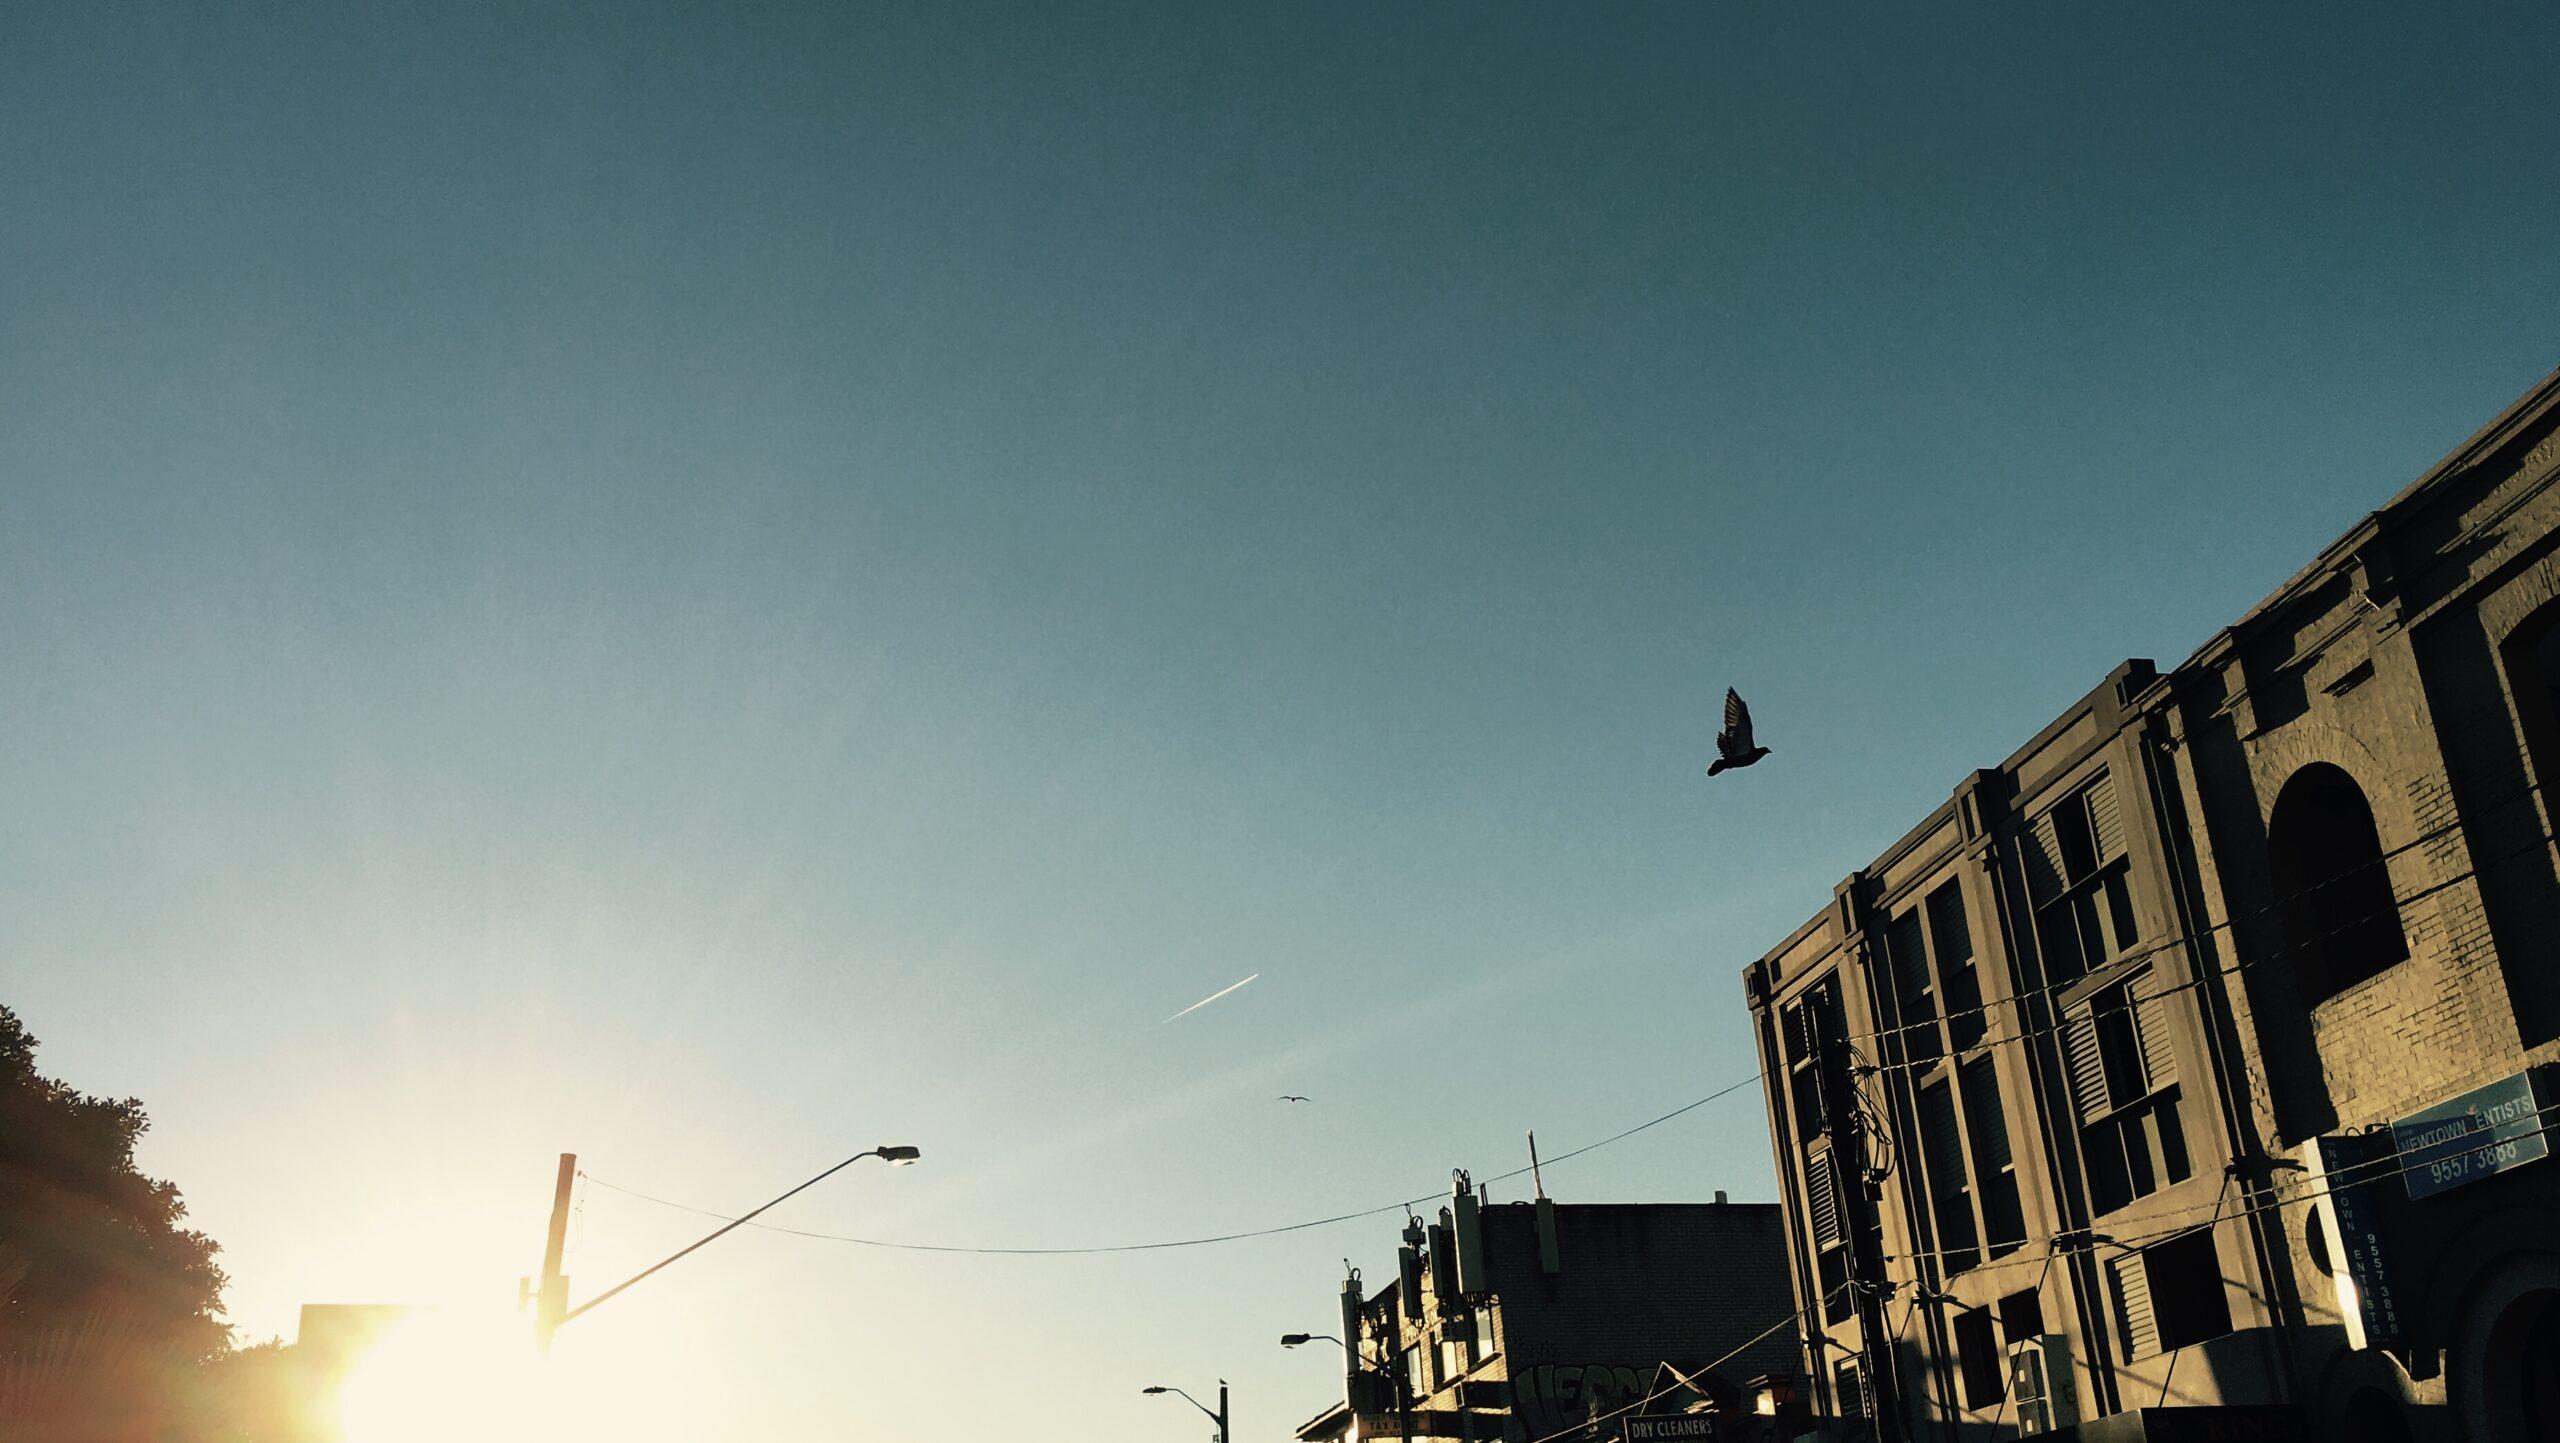 Sunrise, bird, building, shadow